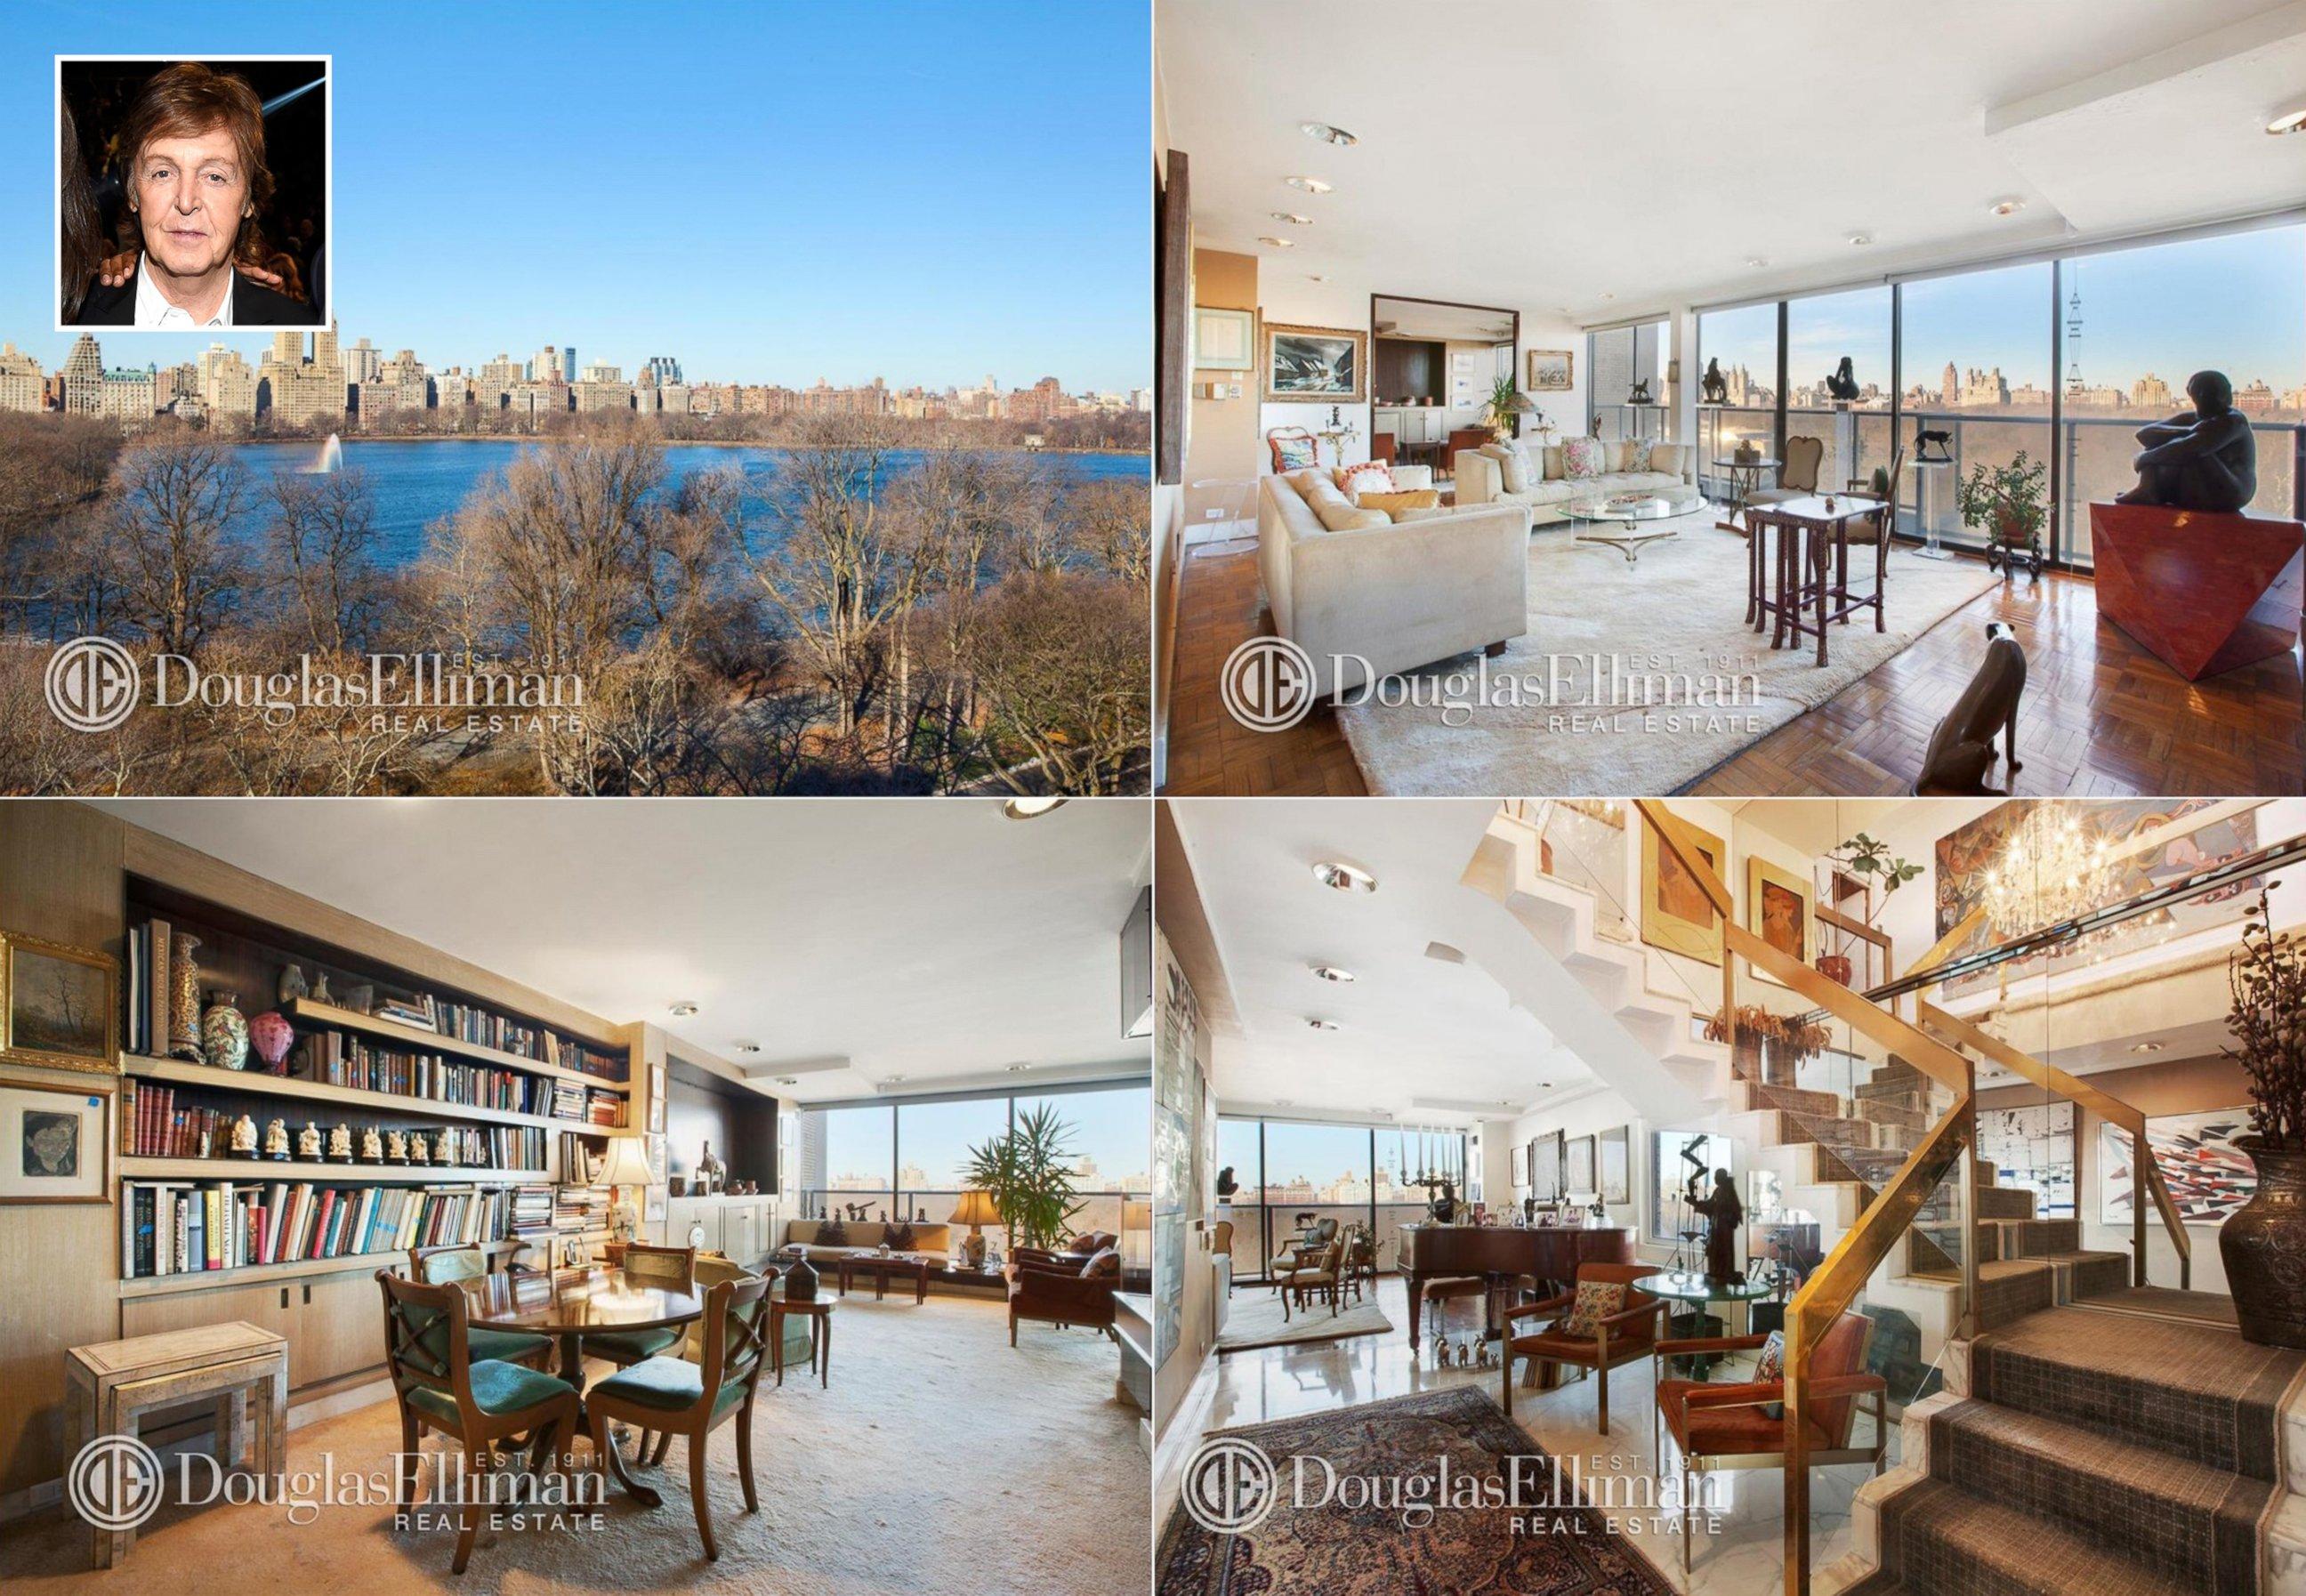 paul mccartney new york apartment latest bestapartment 2018. Black Bedroom Furniture Sets. Home Design Ideas